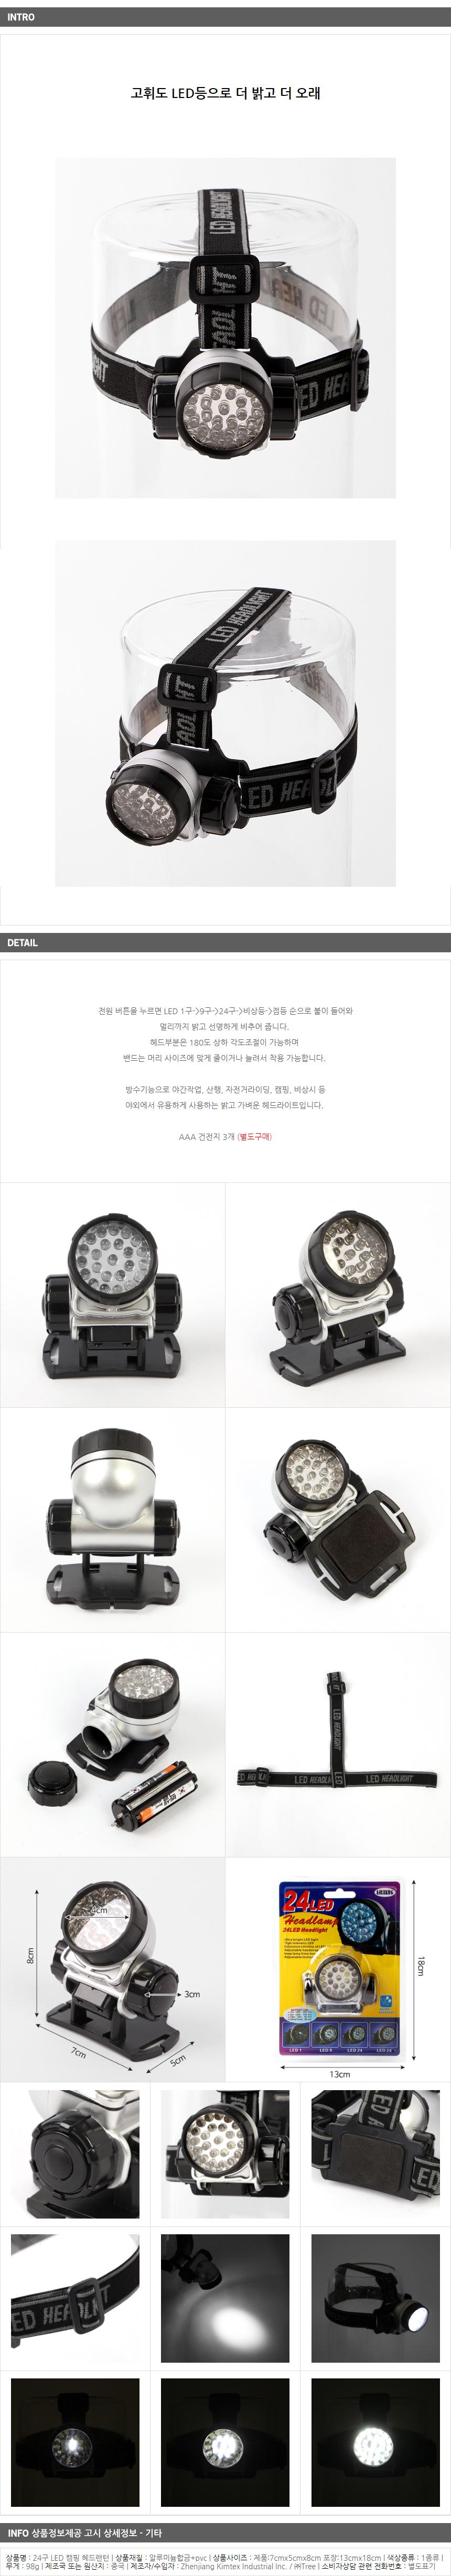 D. 24구 LED 캠핑 헤드랜턴